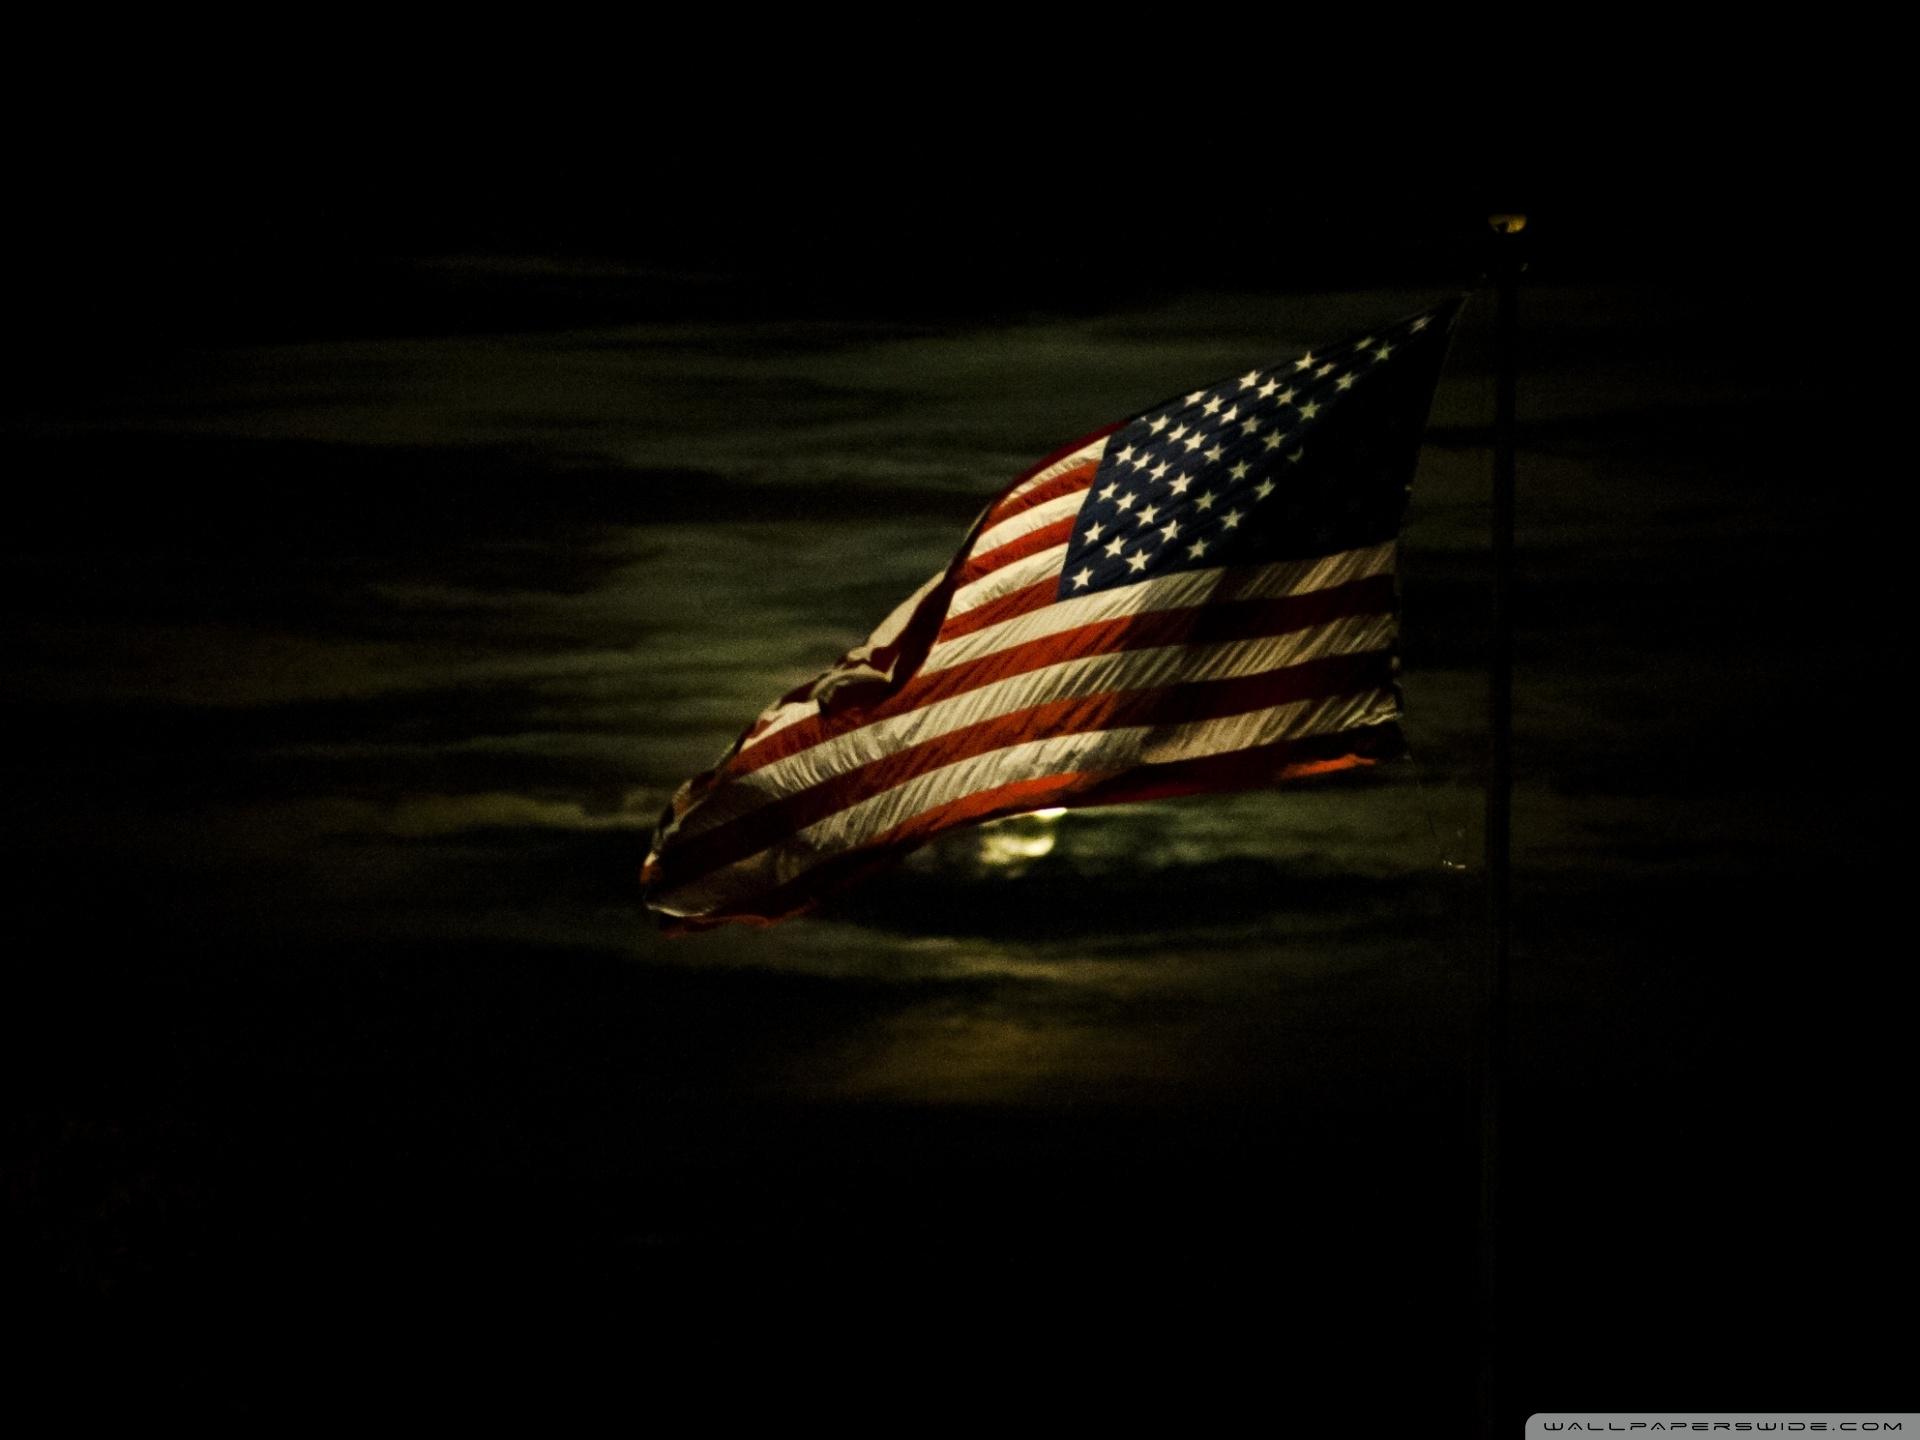 american flag lita full moon ❤ 4k hd desktop wallpaper for 4k